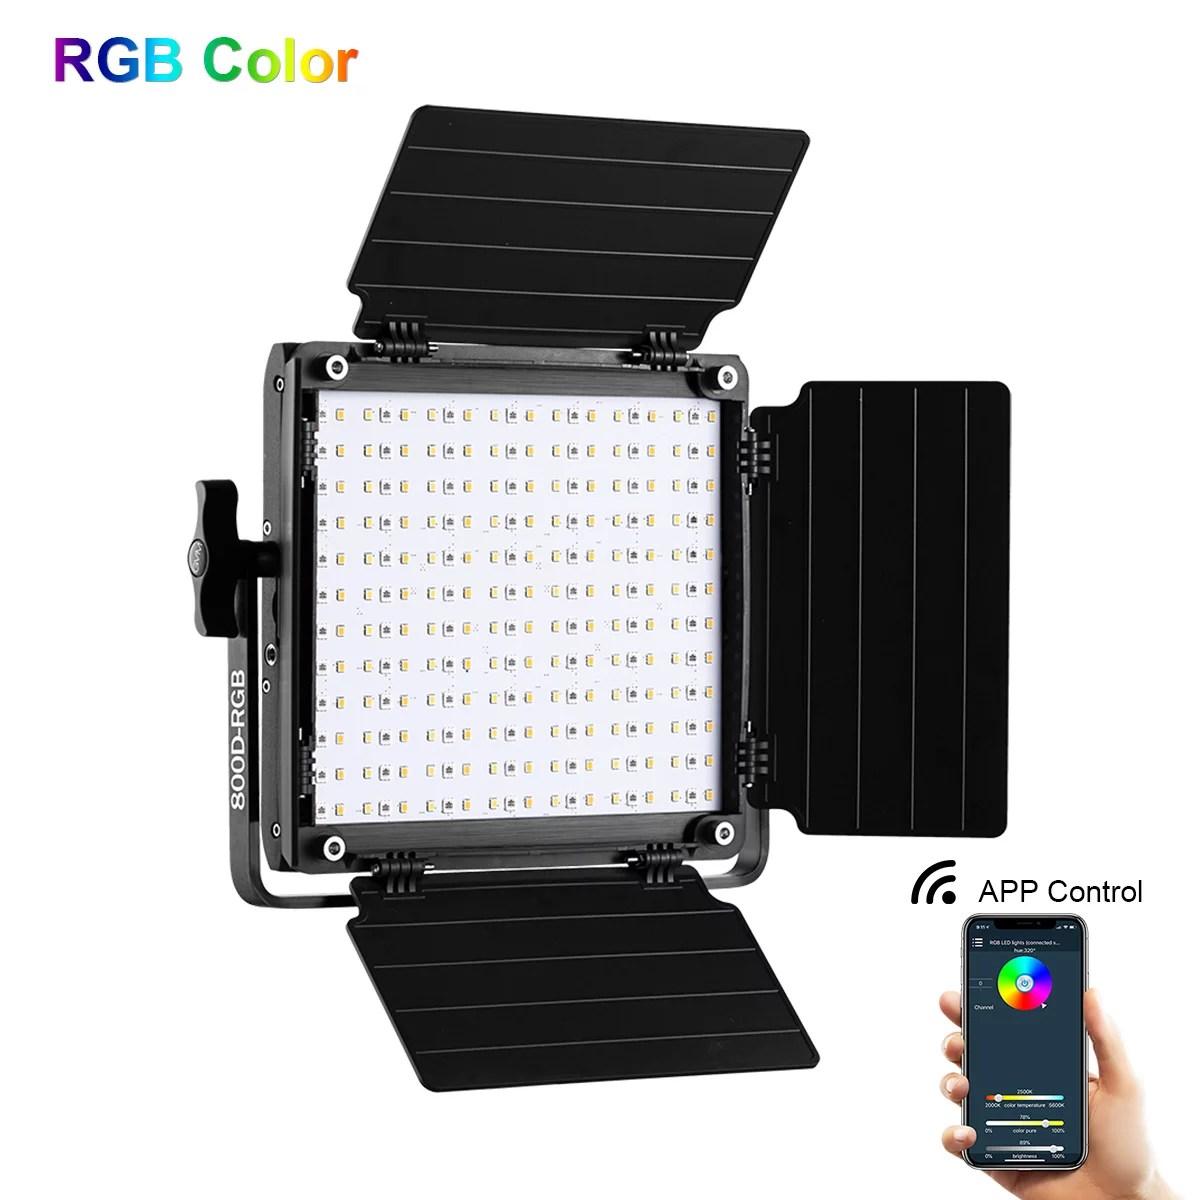 gvm 800d rgb led camera light studio video photography lighting with app control